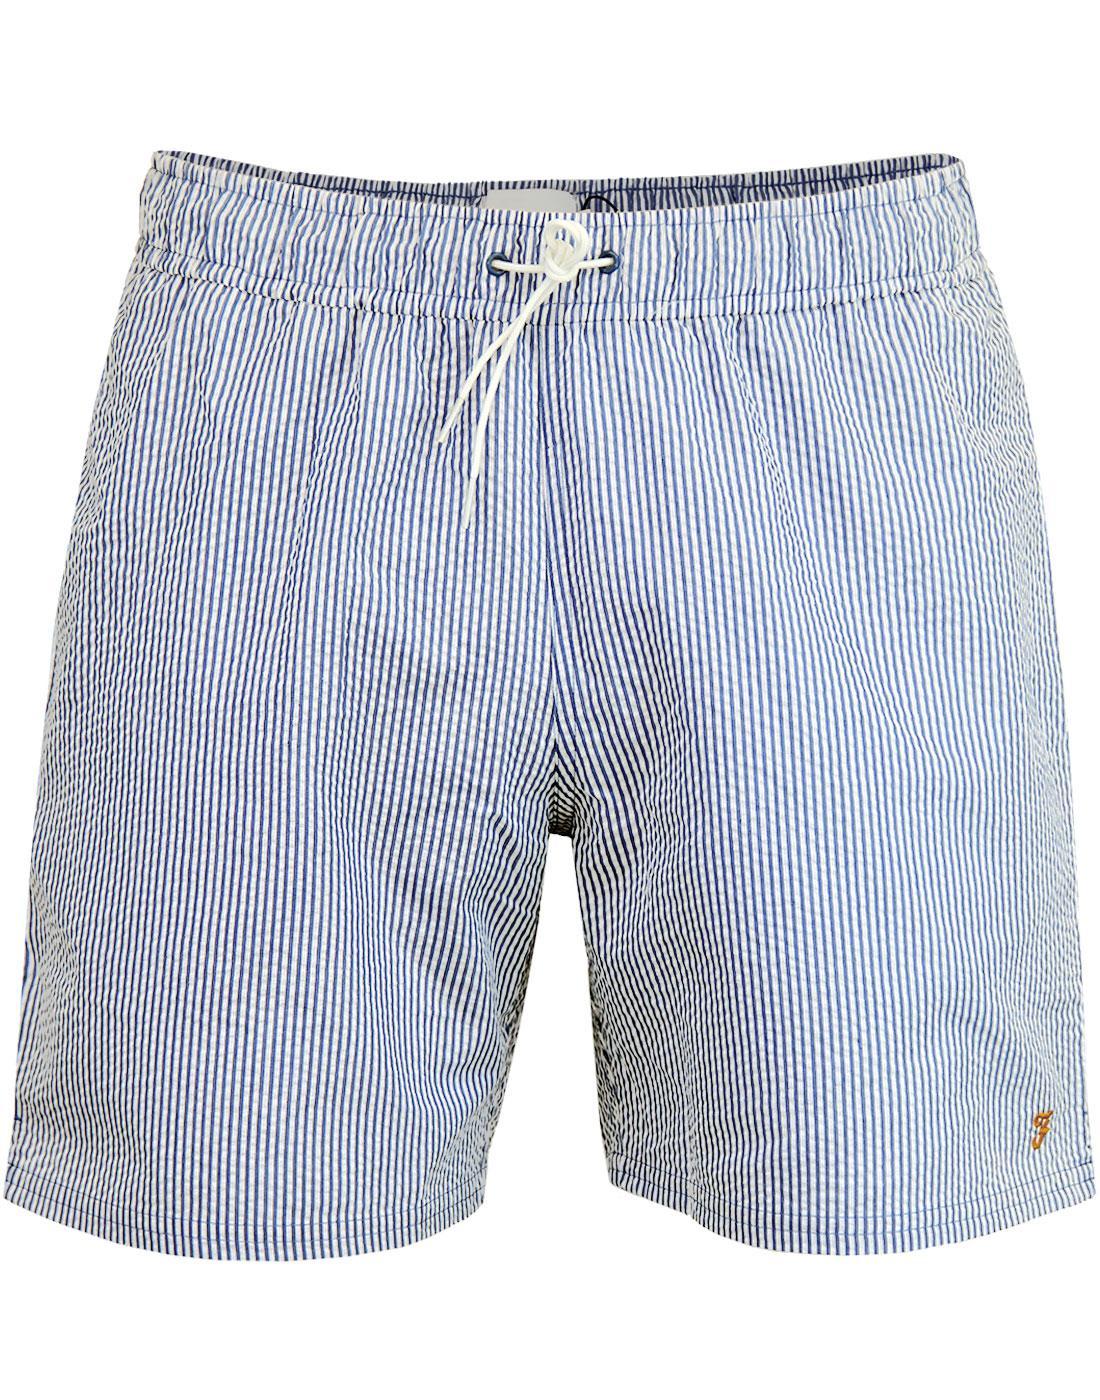 Colbert FARAH Retro Seersucker Stripe Swim Shorts